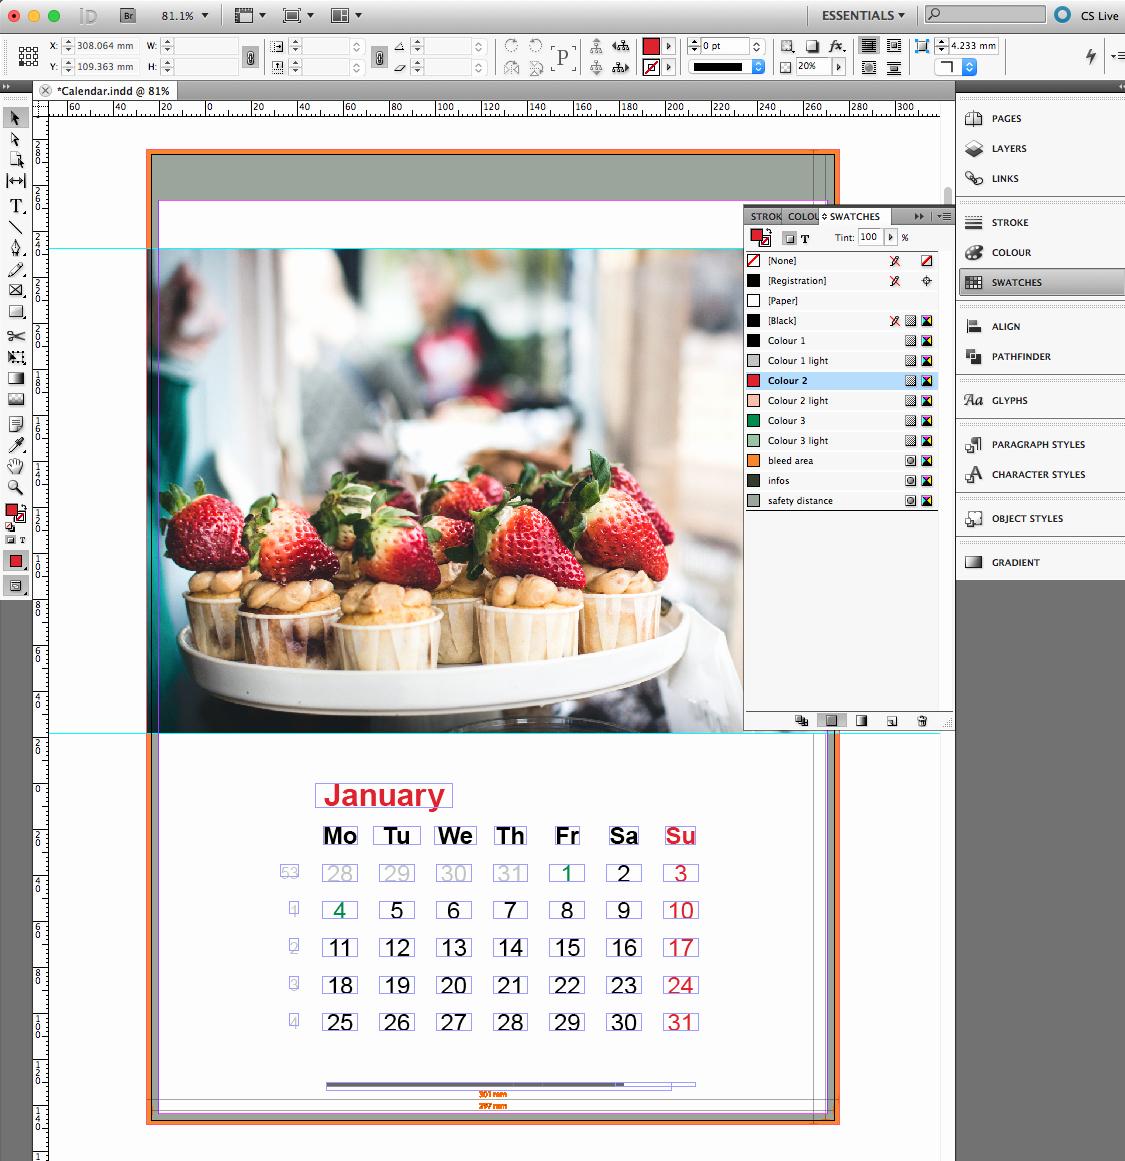 2016 Calendar Template Indesign Unique Corporate Calendar In Indesign Incl Template Saxoprint